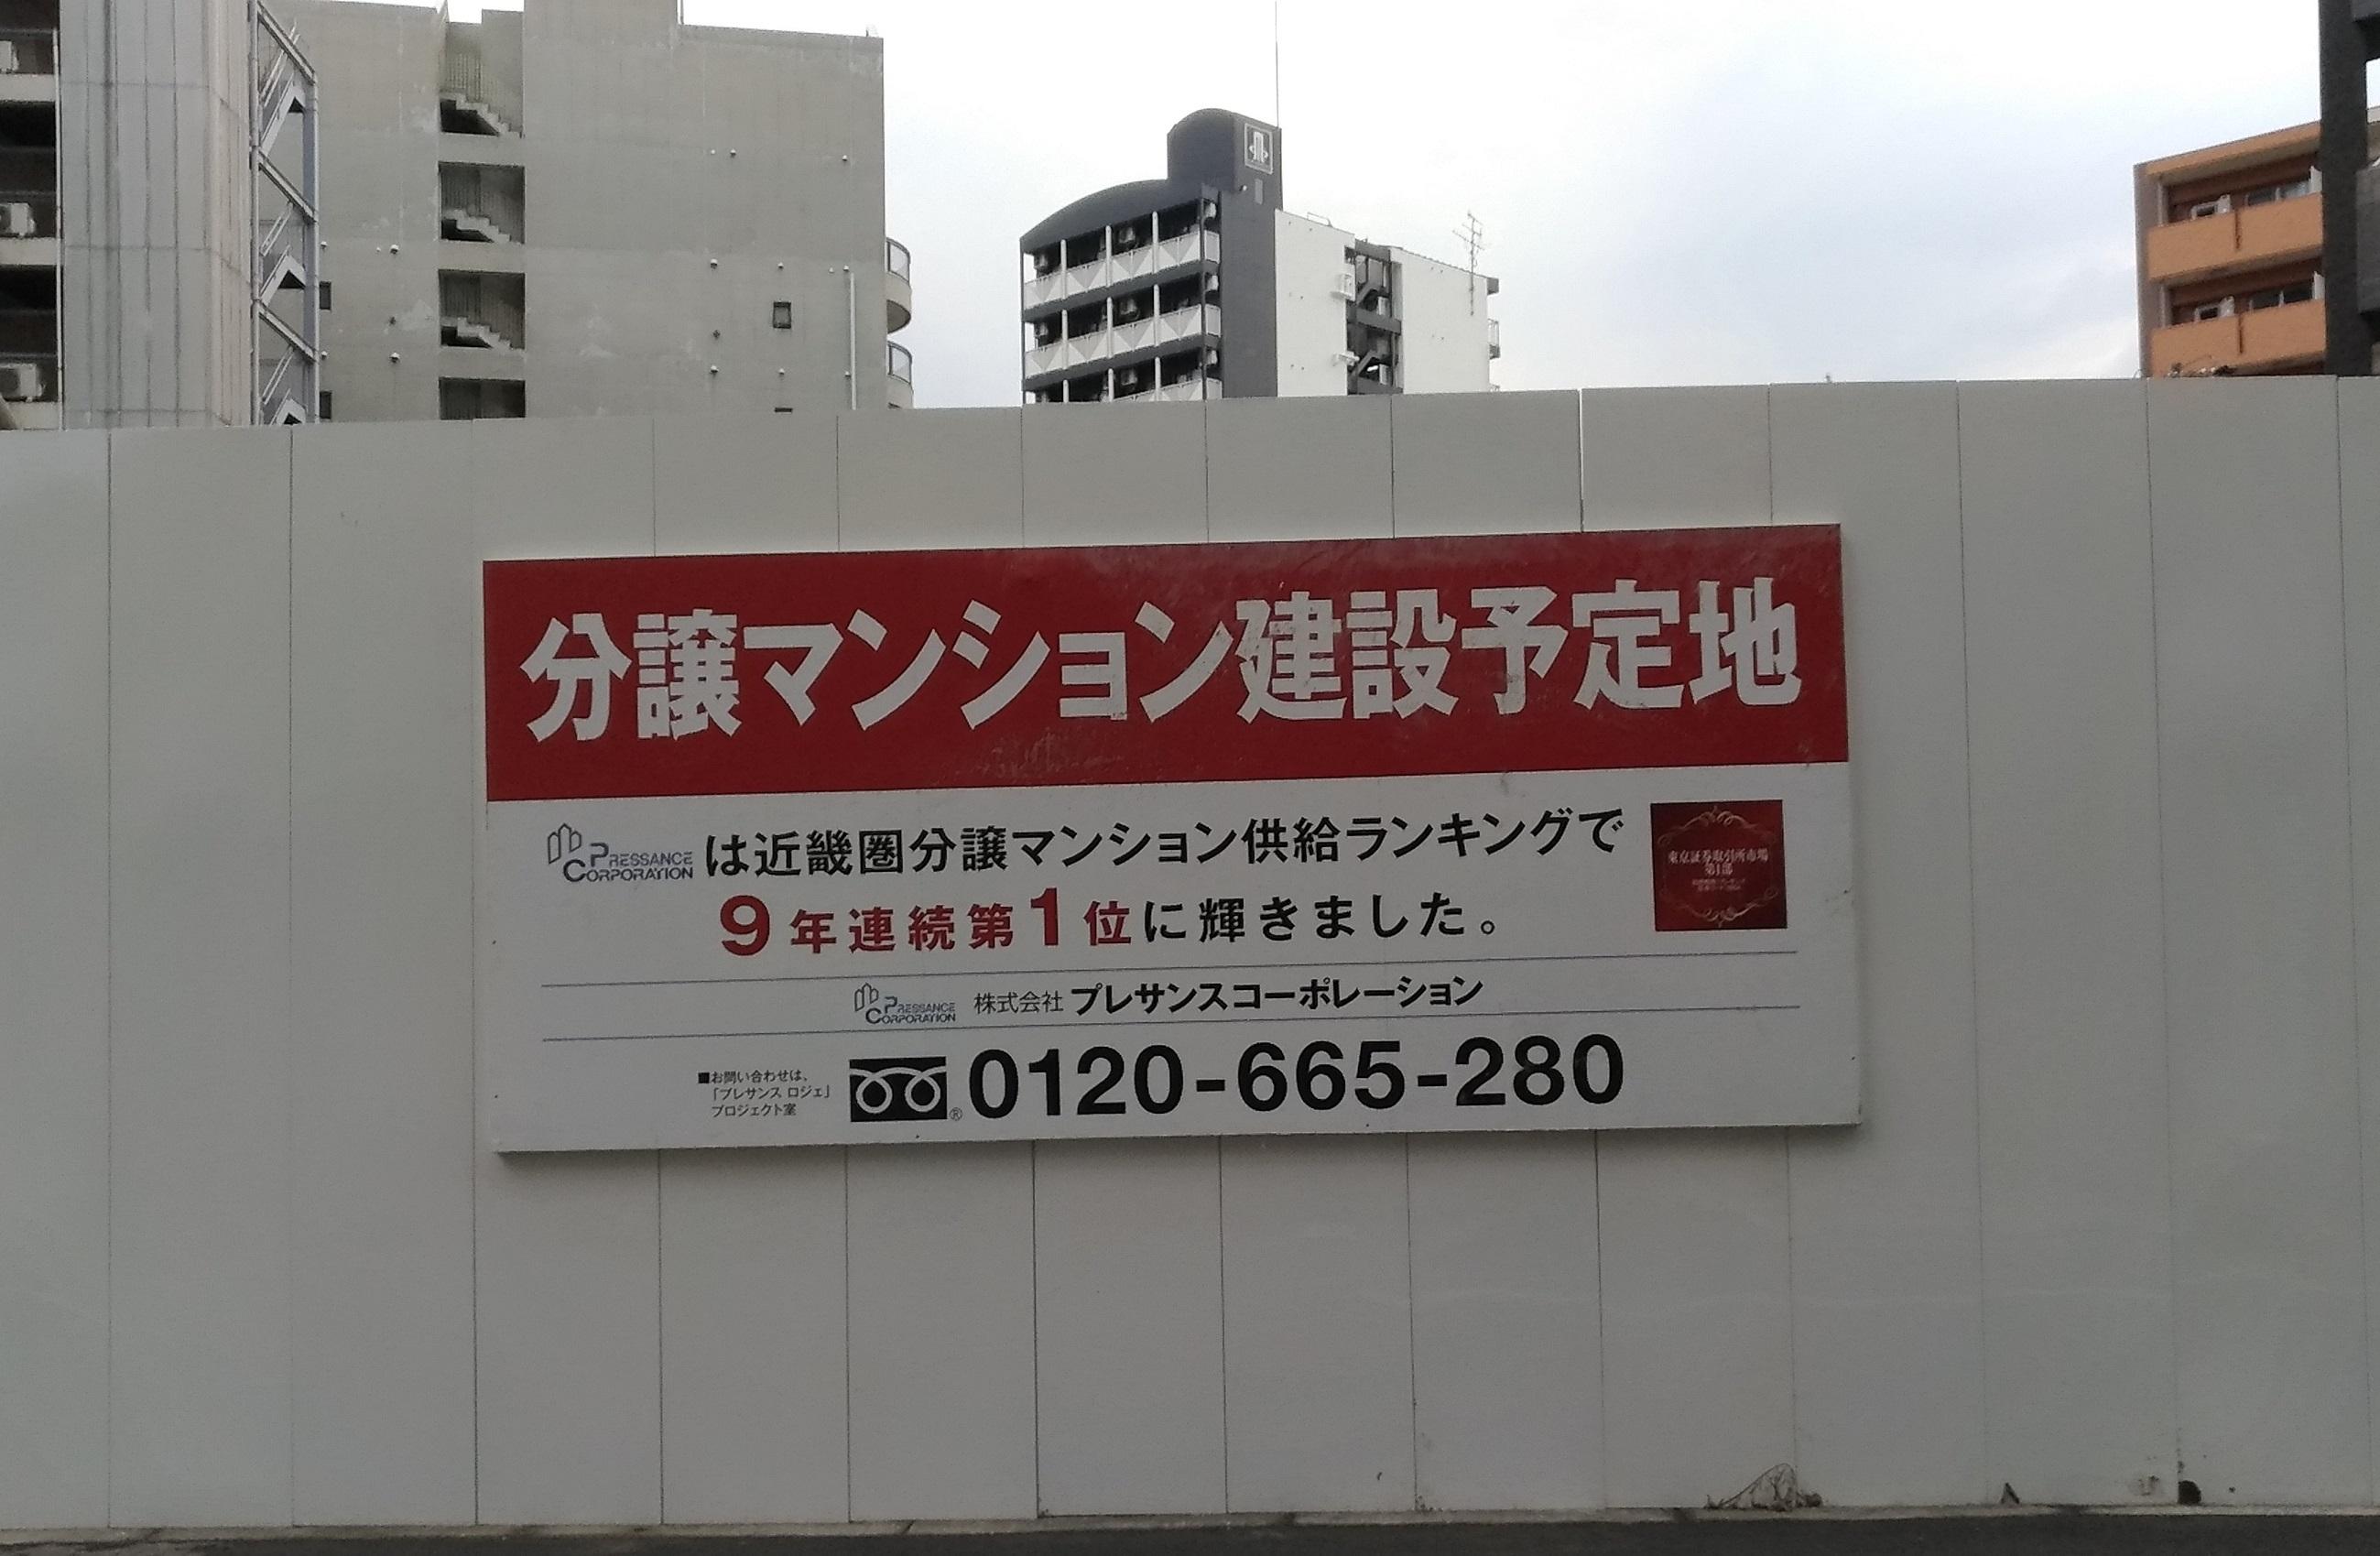 osaka_manshon_new_build_kitaku_oyodo_3.jpg